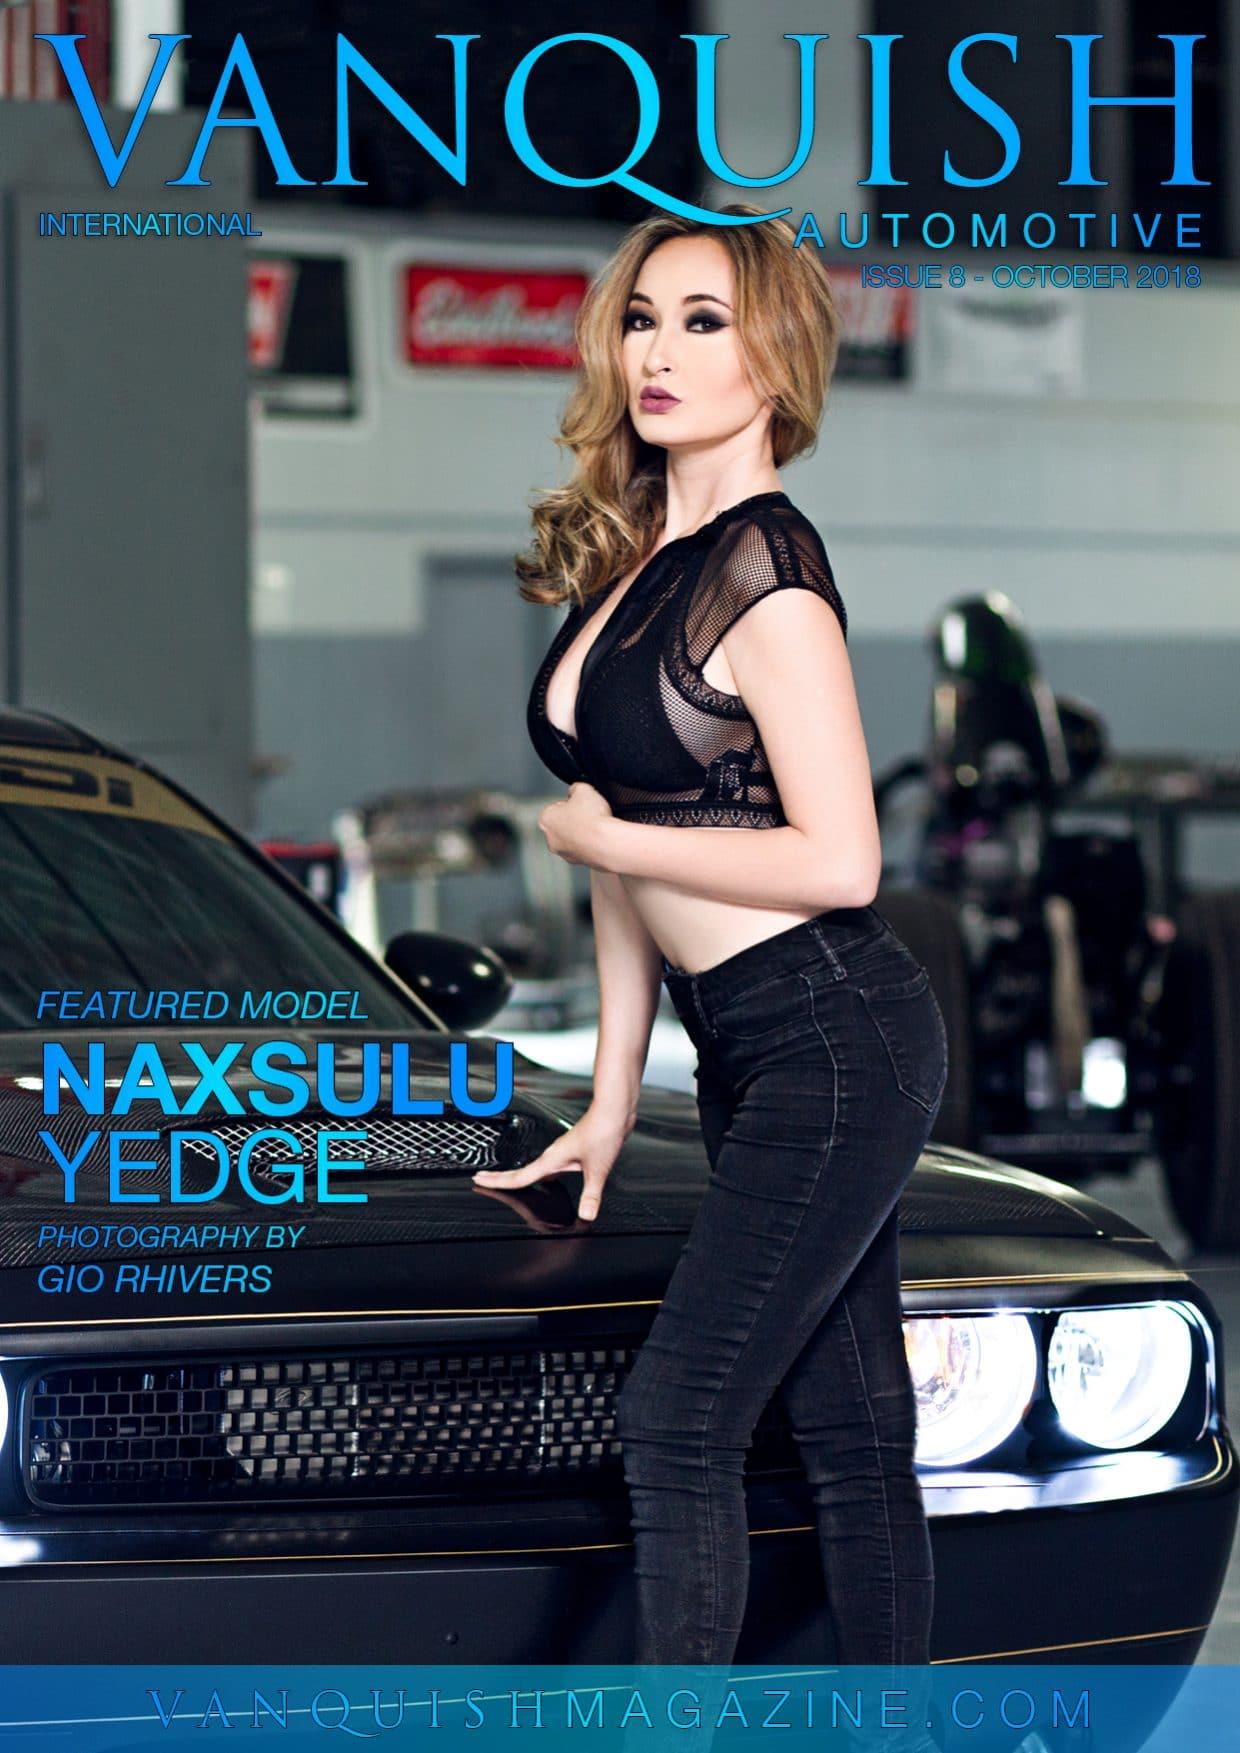 Vanquish Automotive – October 2018 – Naxsulu Yedge